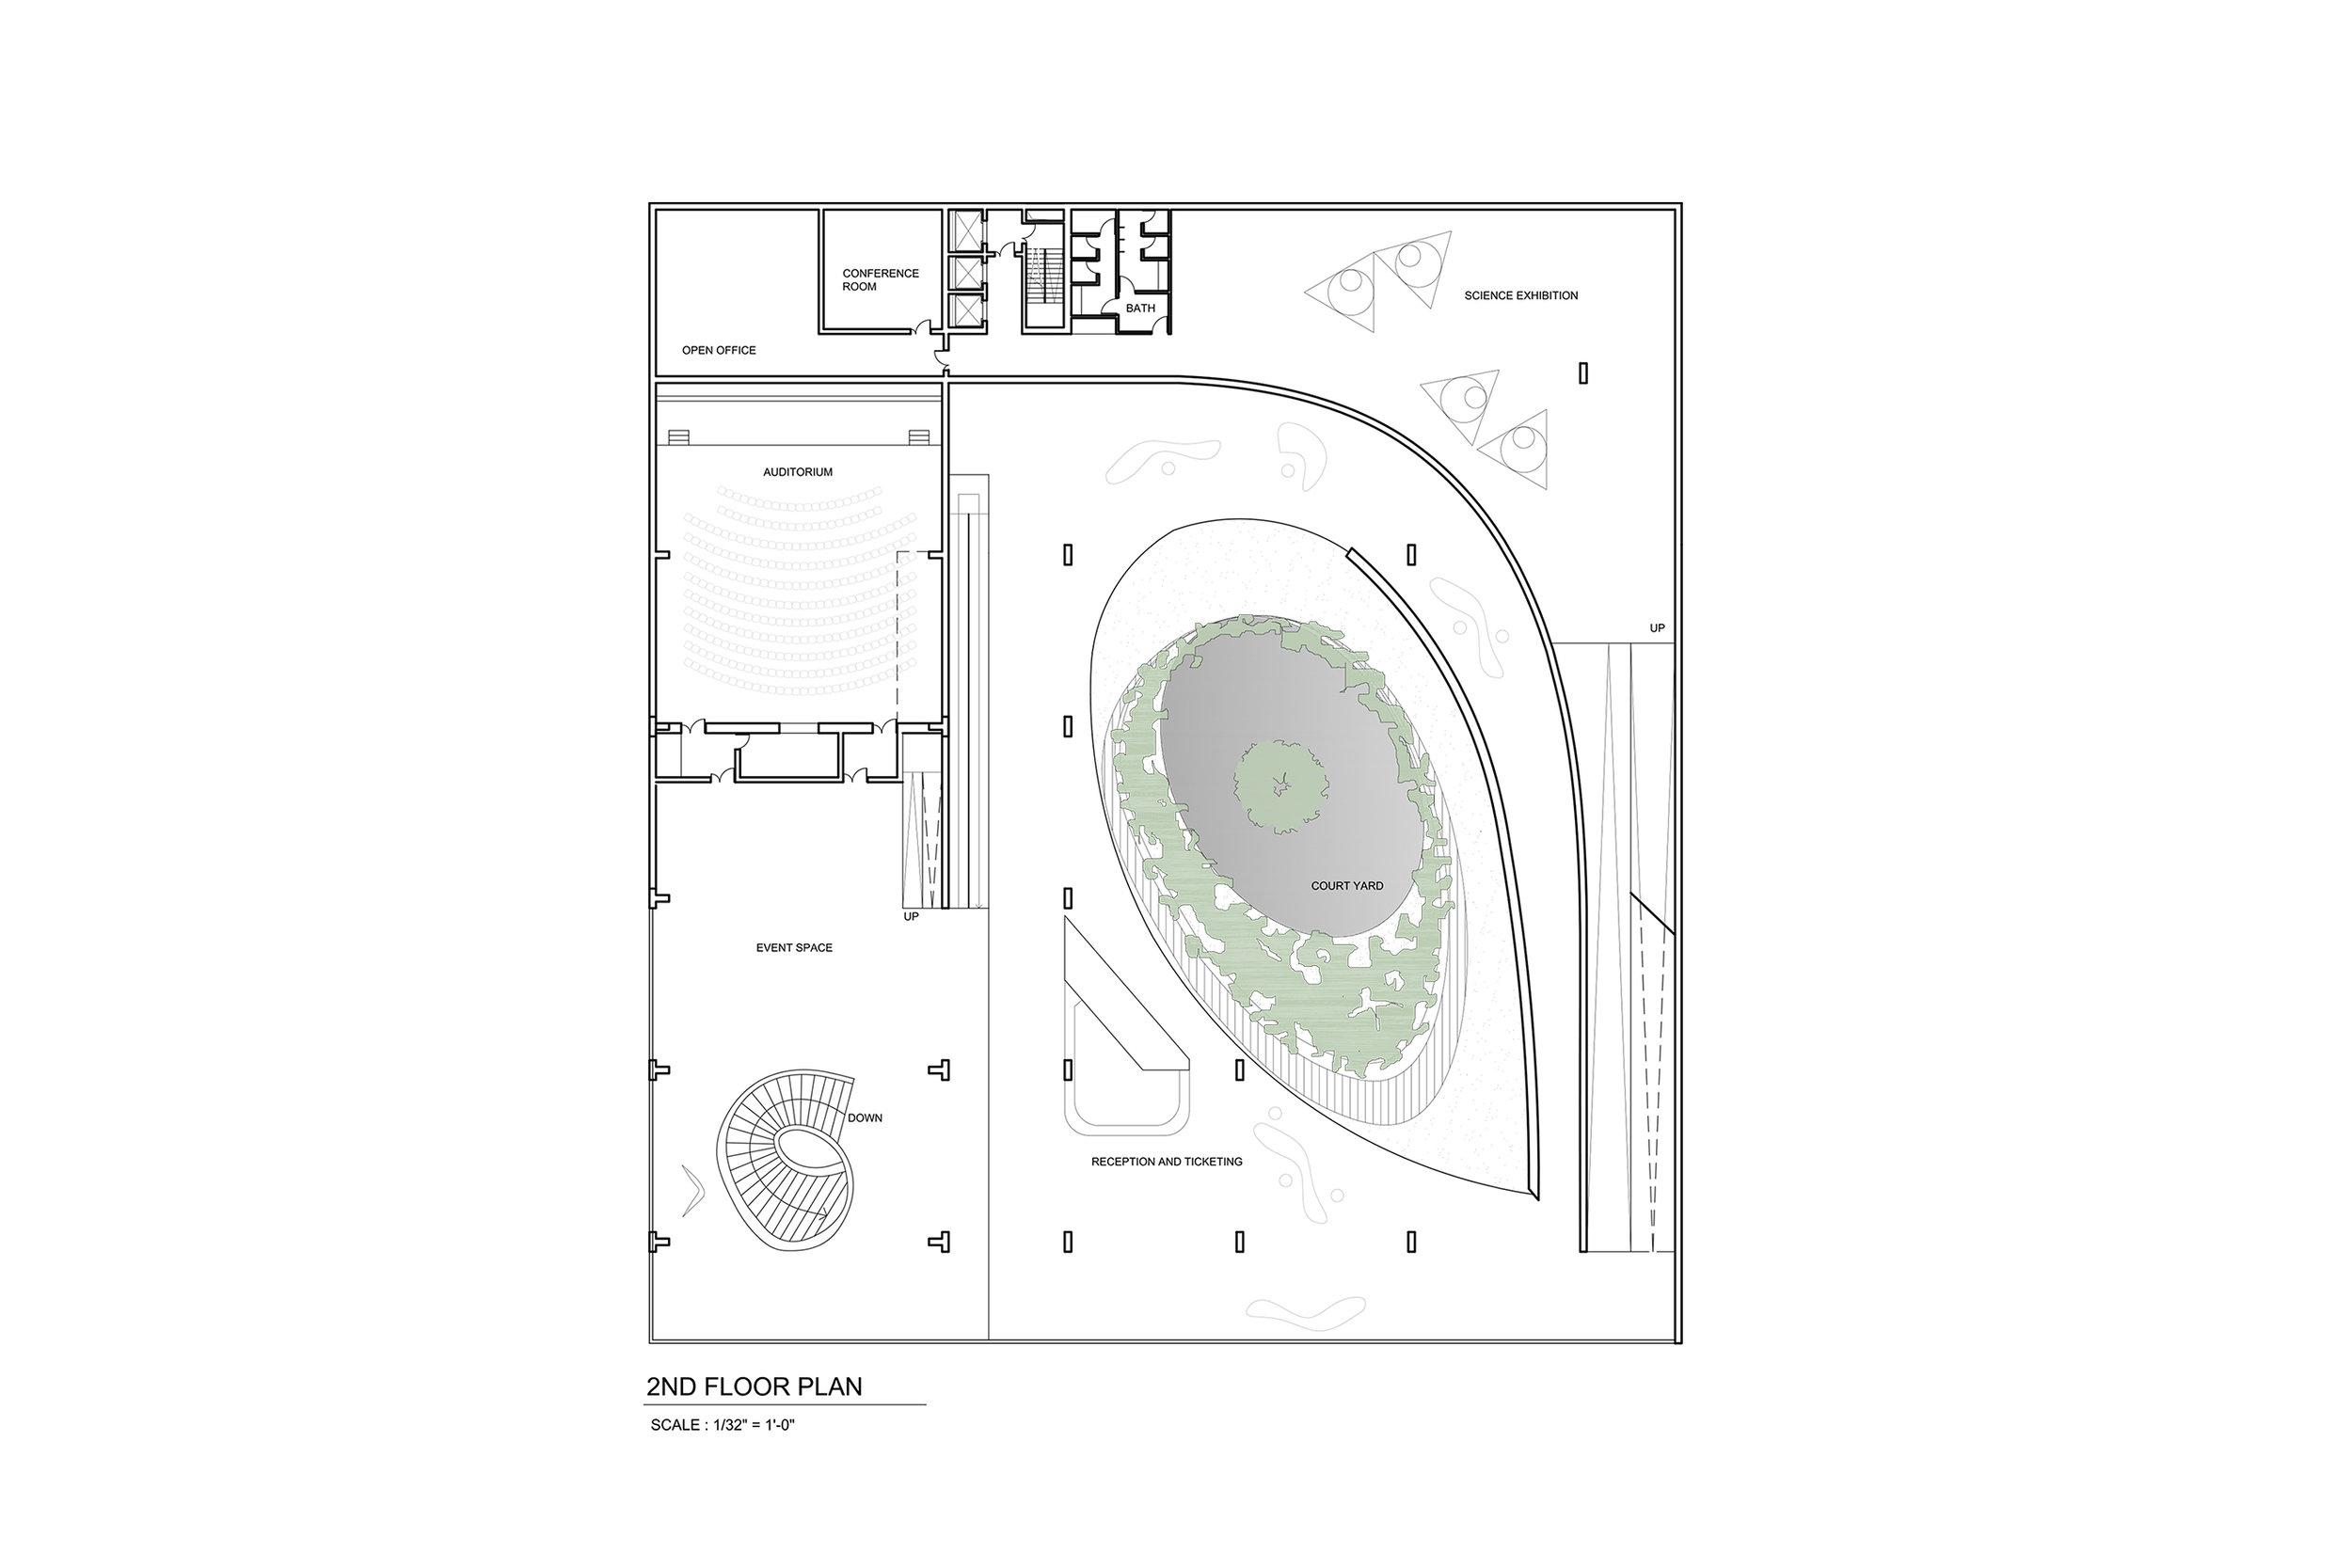 04 Hadilou Architecture_Second Floor LCM.jpg